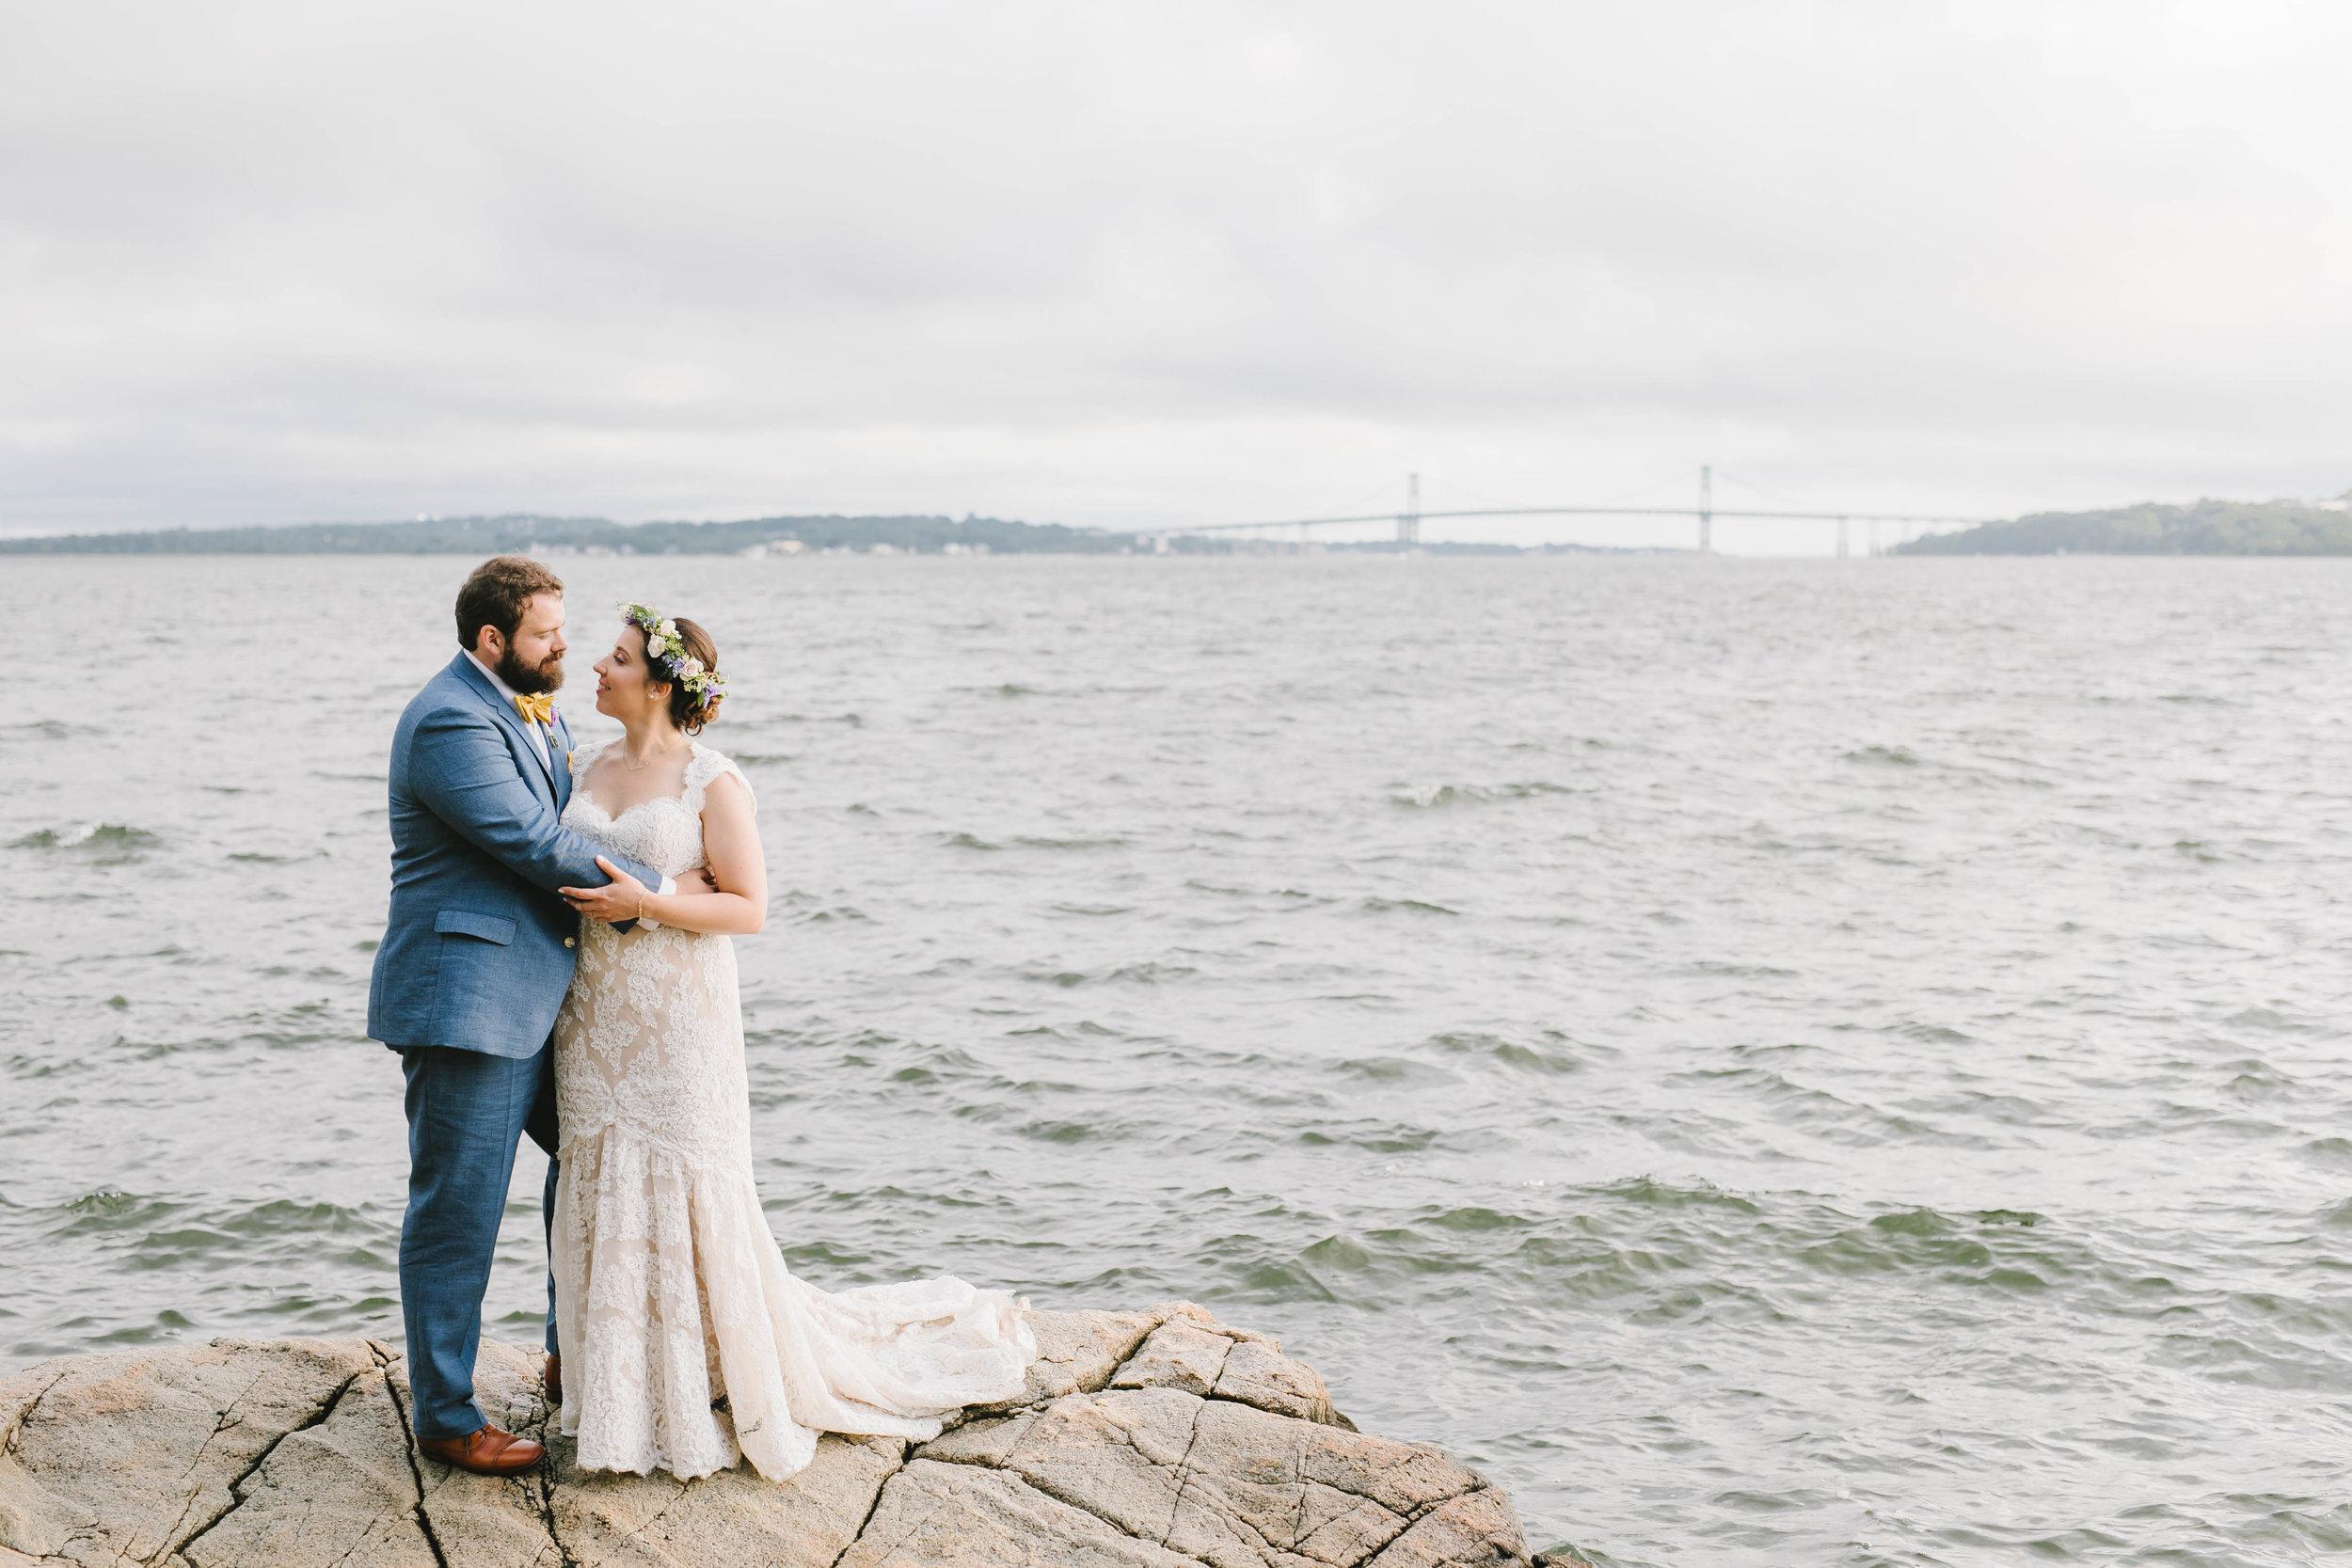 Mount Hope Farm Bristol Rhode Island RI New England Coastal Flower Crown Wedding - Emily Tebbetts Photography-16.jpg